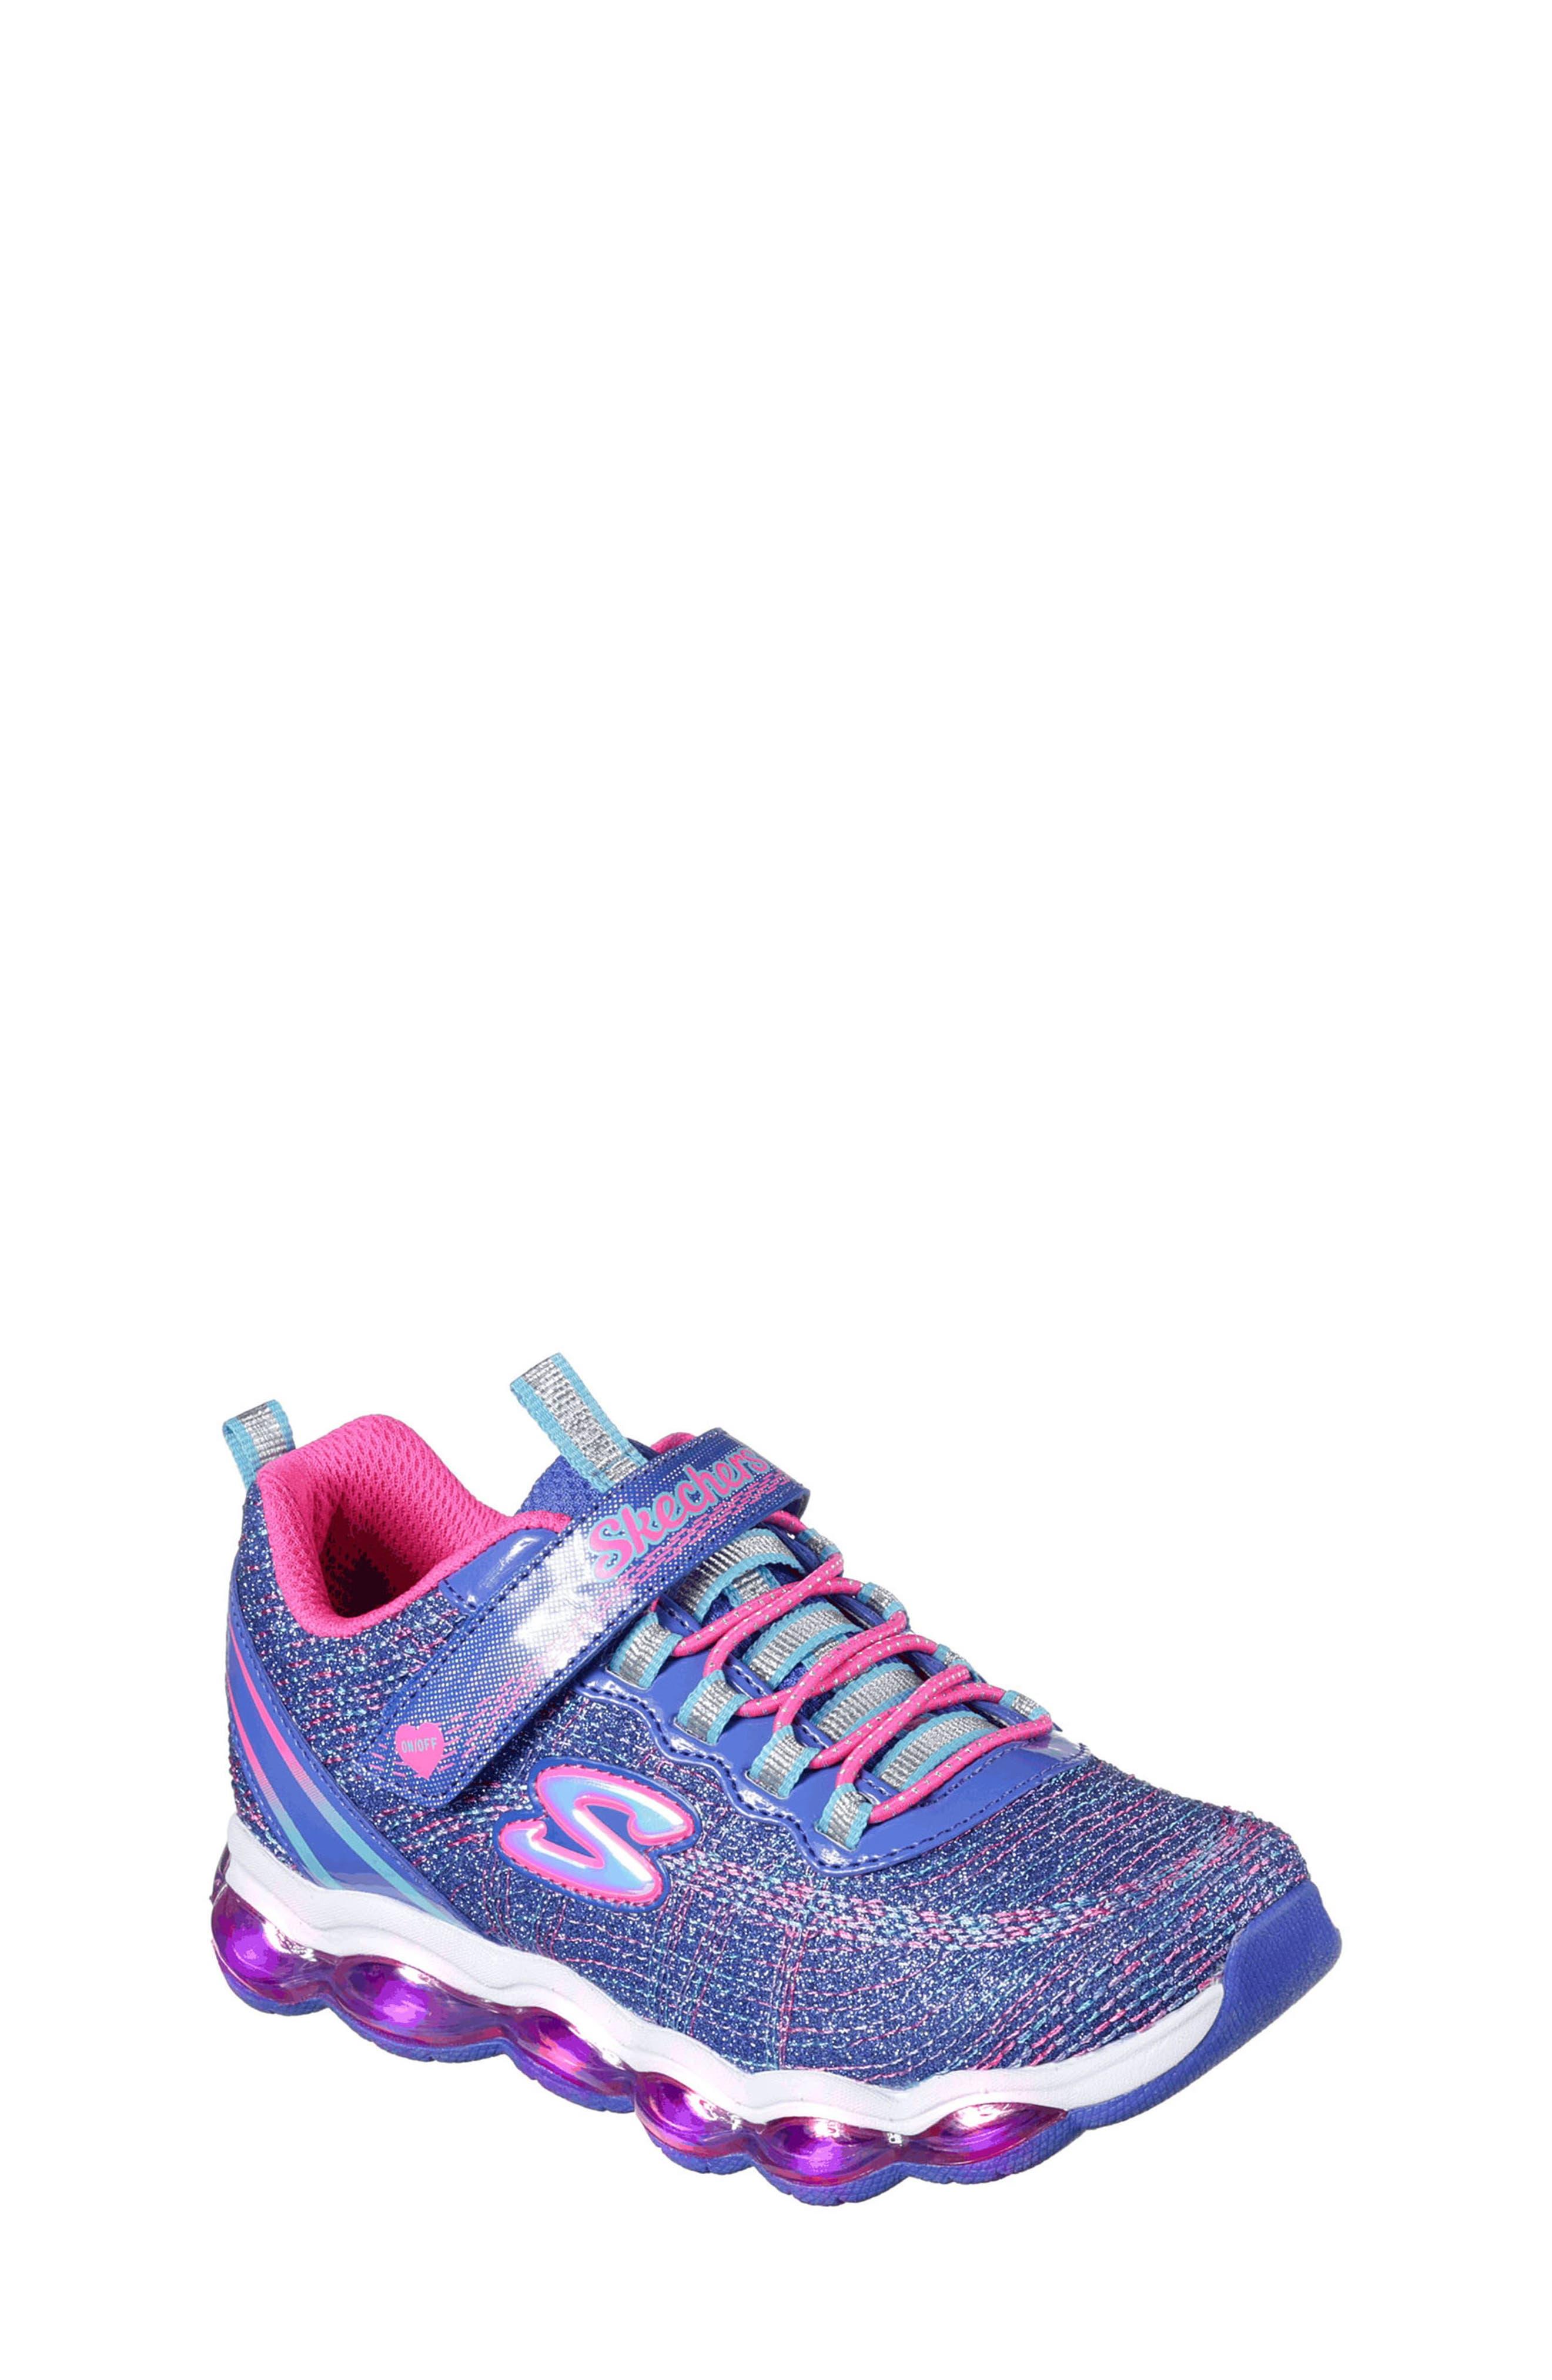 Alternate Image 1 Selected - SKECHERS Glimmer Lights Sneakers (Toddler & Little Kid)